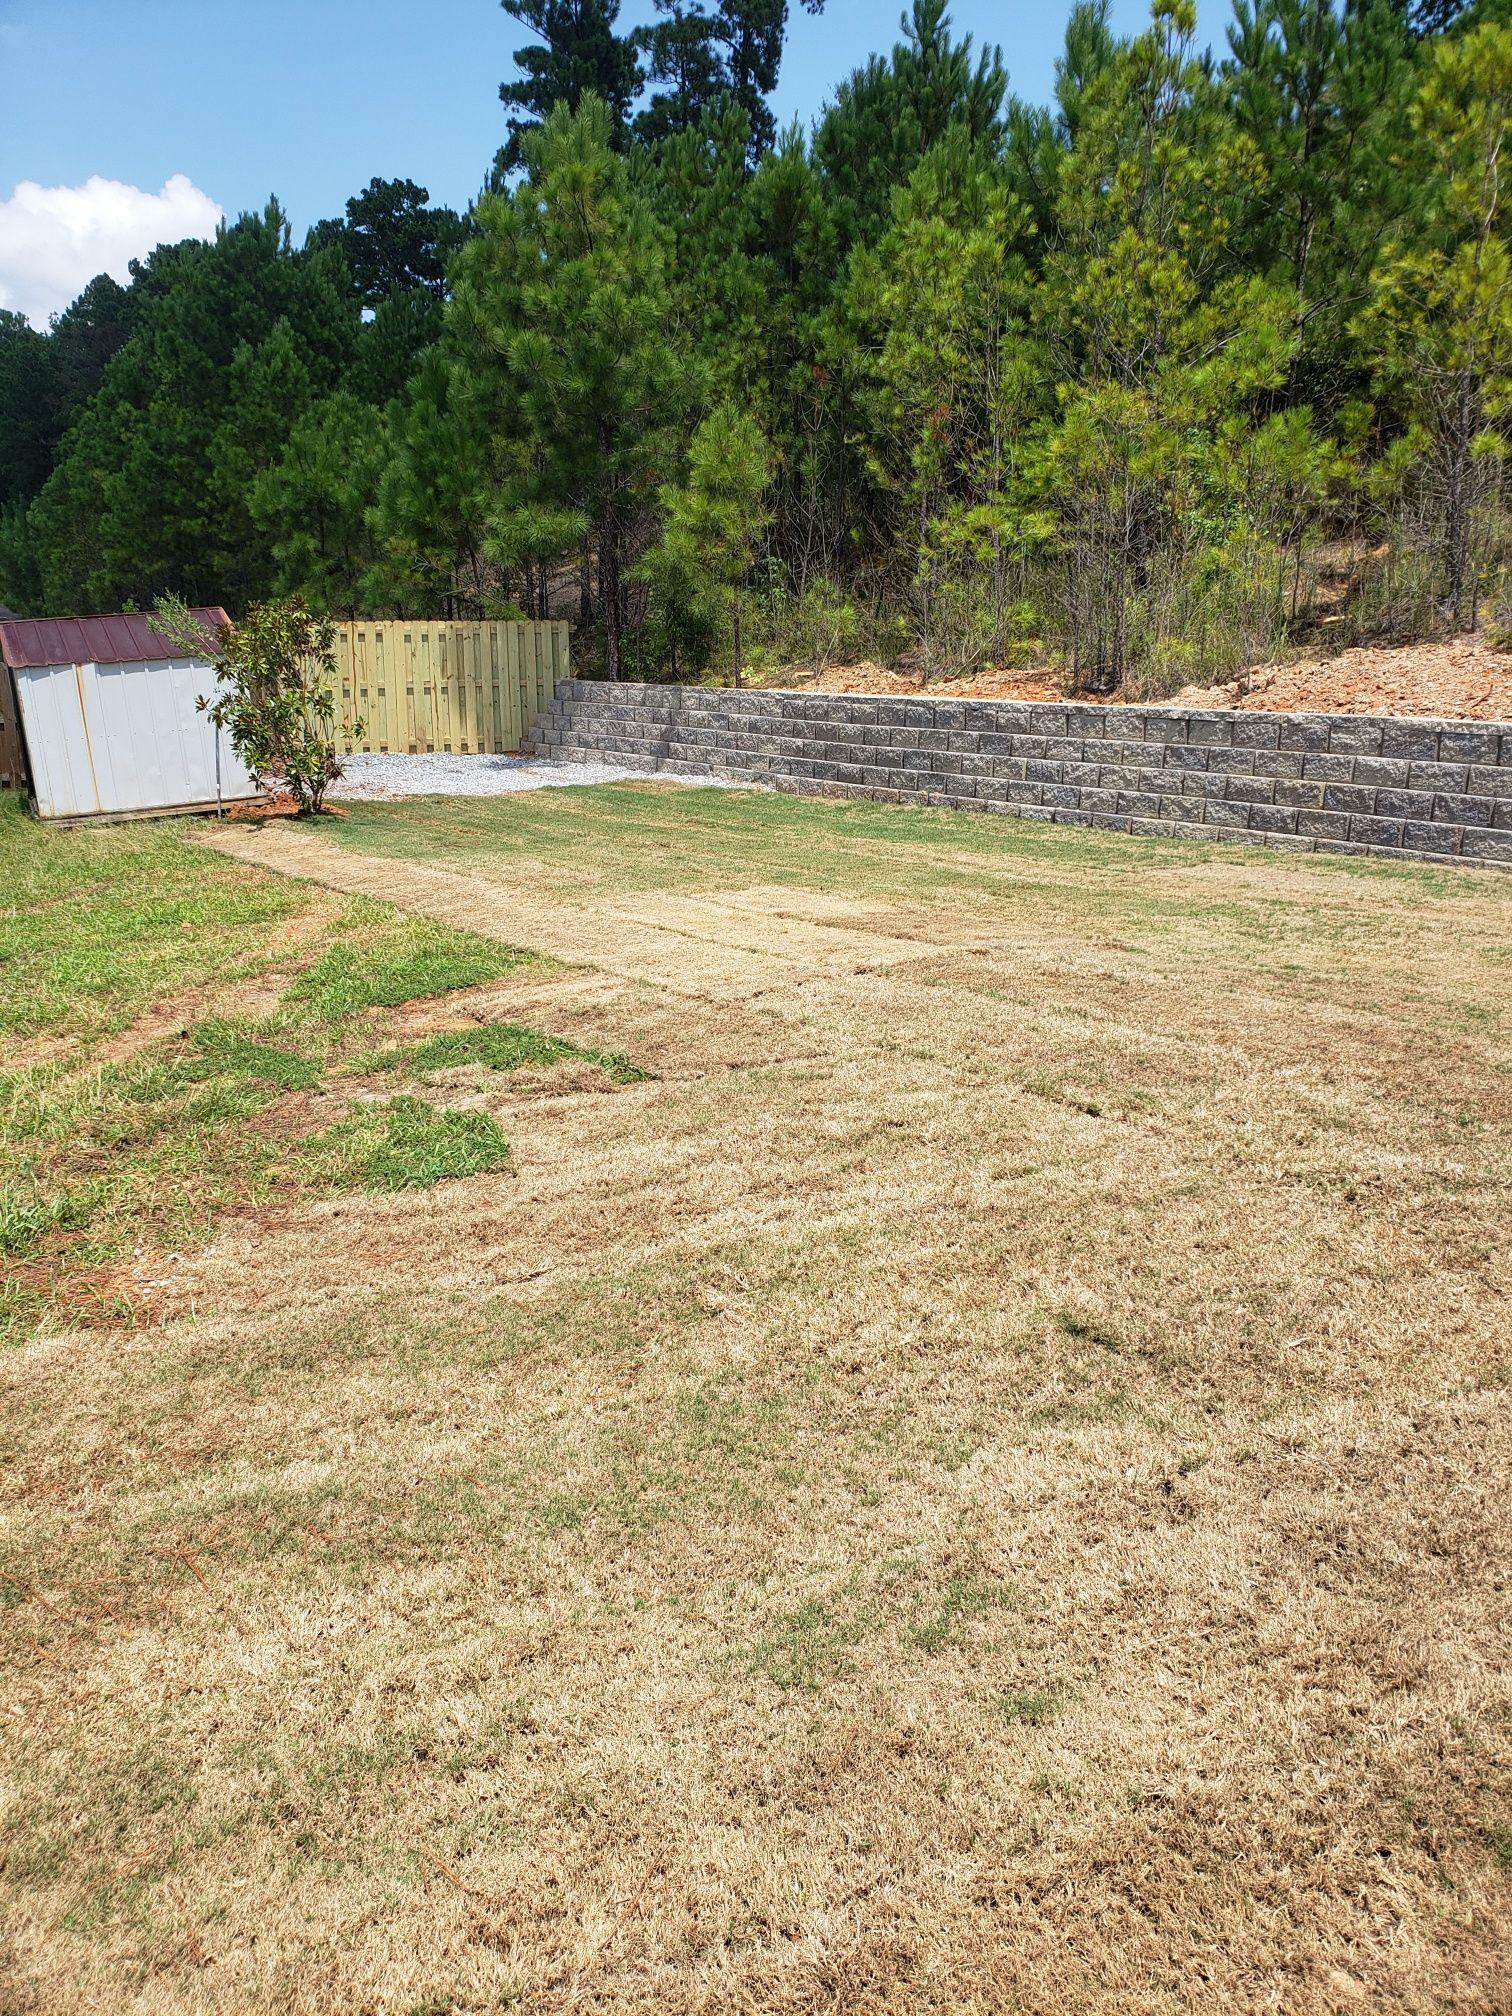 Yard Accents Landscape & Fence Design image 33